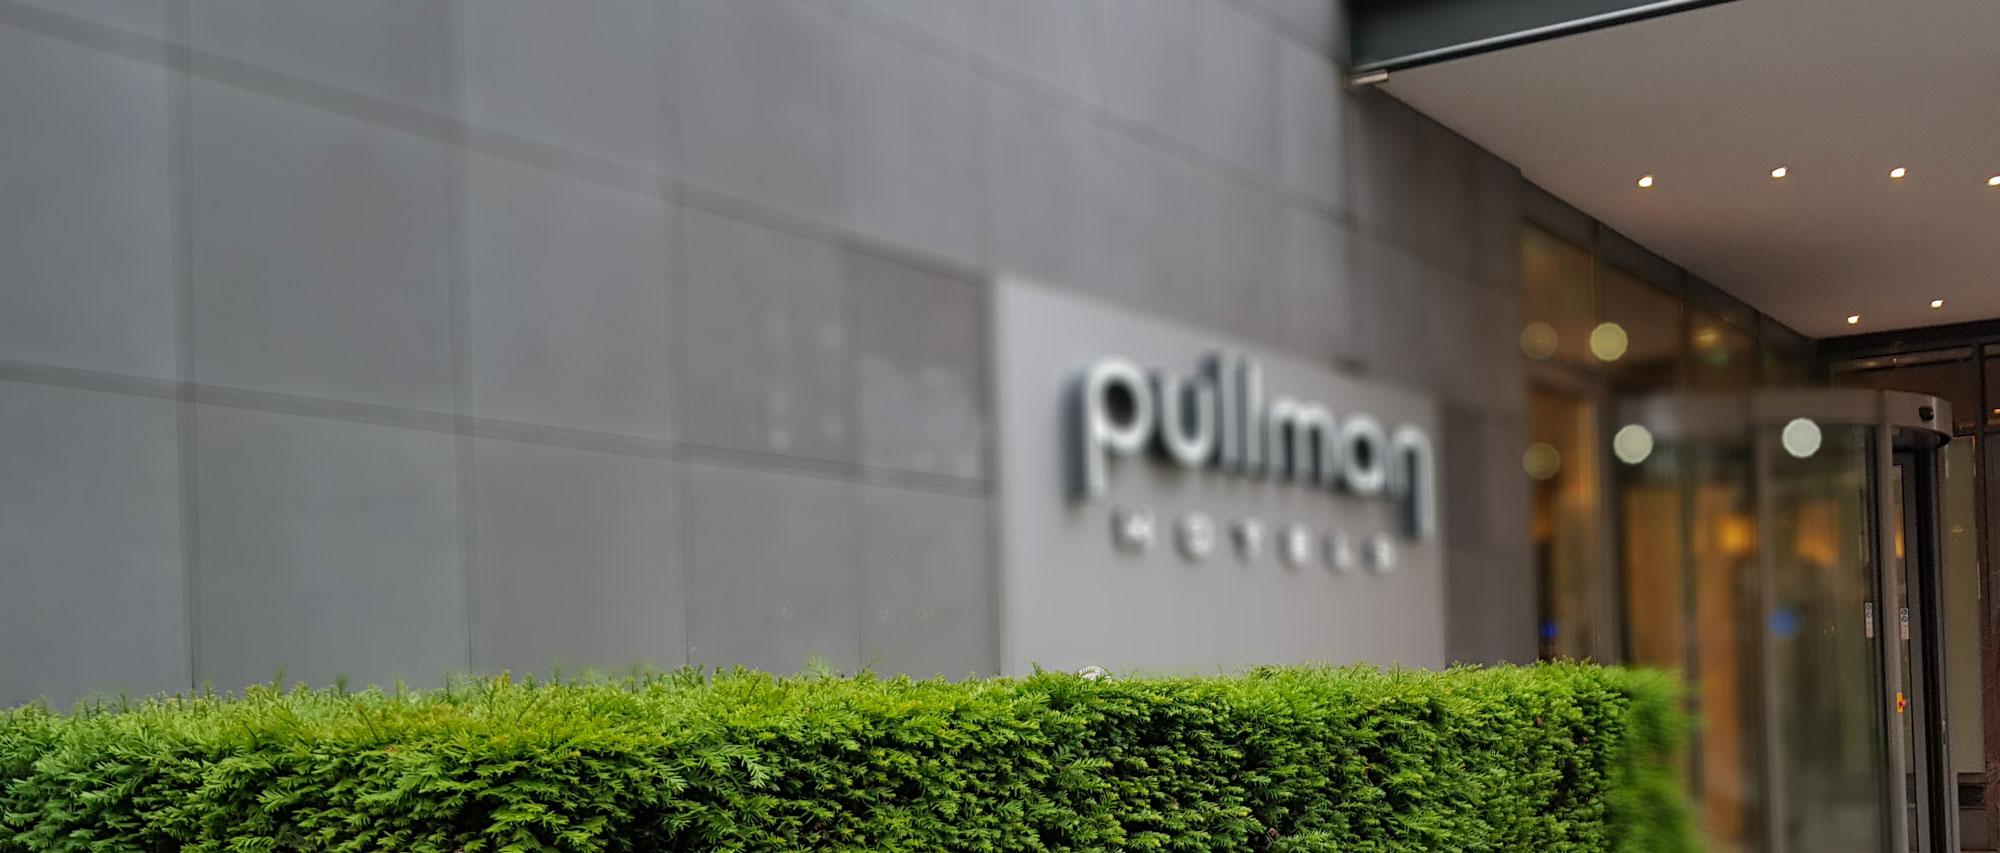 Pullman Cocagne Eindhoven - Luxury hotel - Center